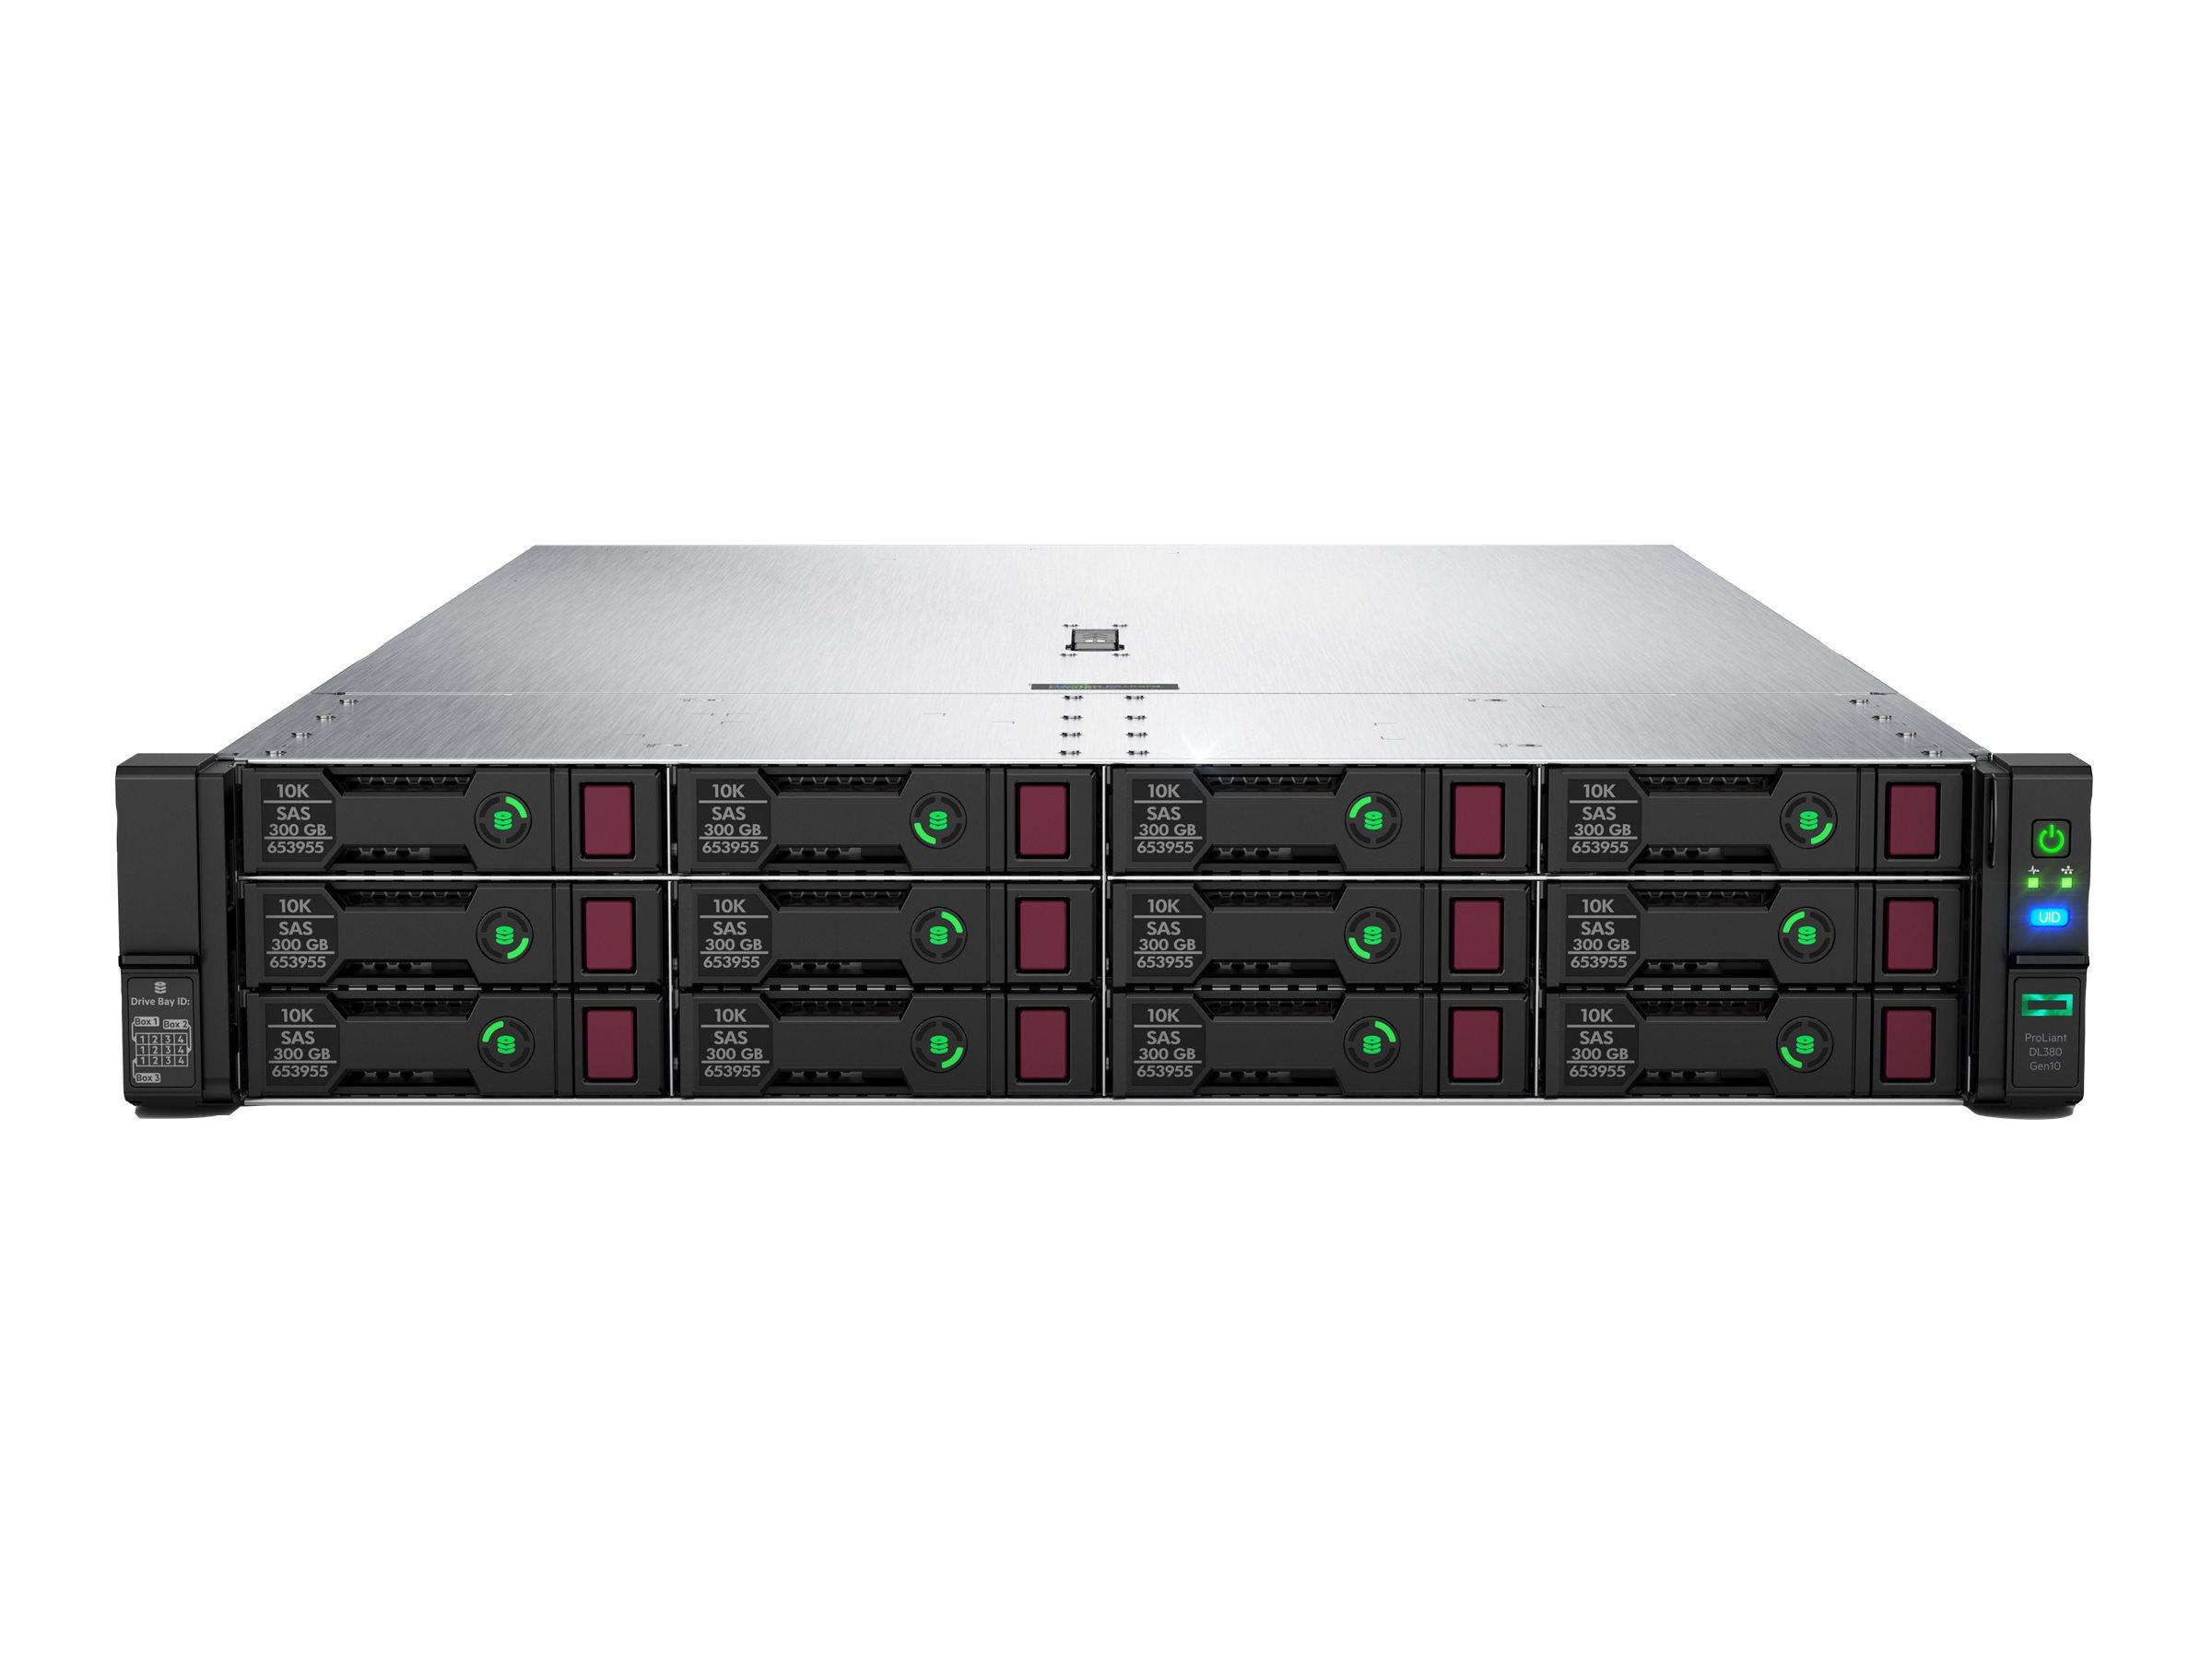 "HPE ProLiant DL380 Gen10 - Server - Rack-Montage - 2U - zweiweg - 1 x Xeon Gold 5218 / 2.3 GHz - RAM 32 GB - SATA - Hot-Swap 6.4 cm (2.5"")"